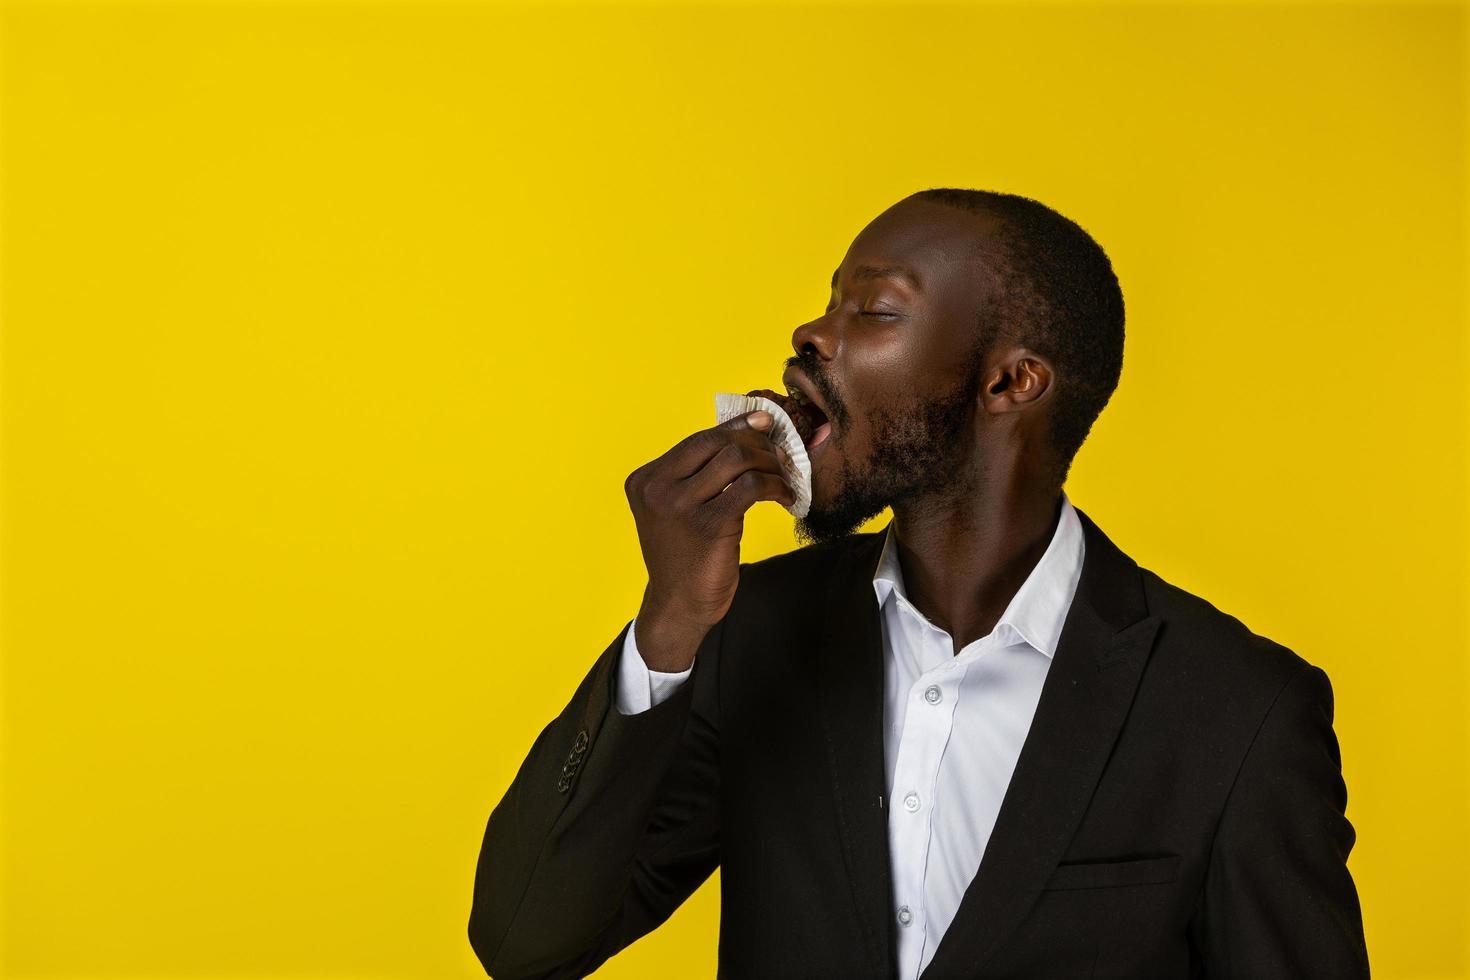 jonge kerel eet cupcake foto